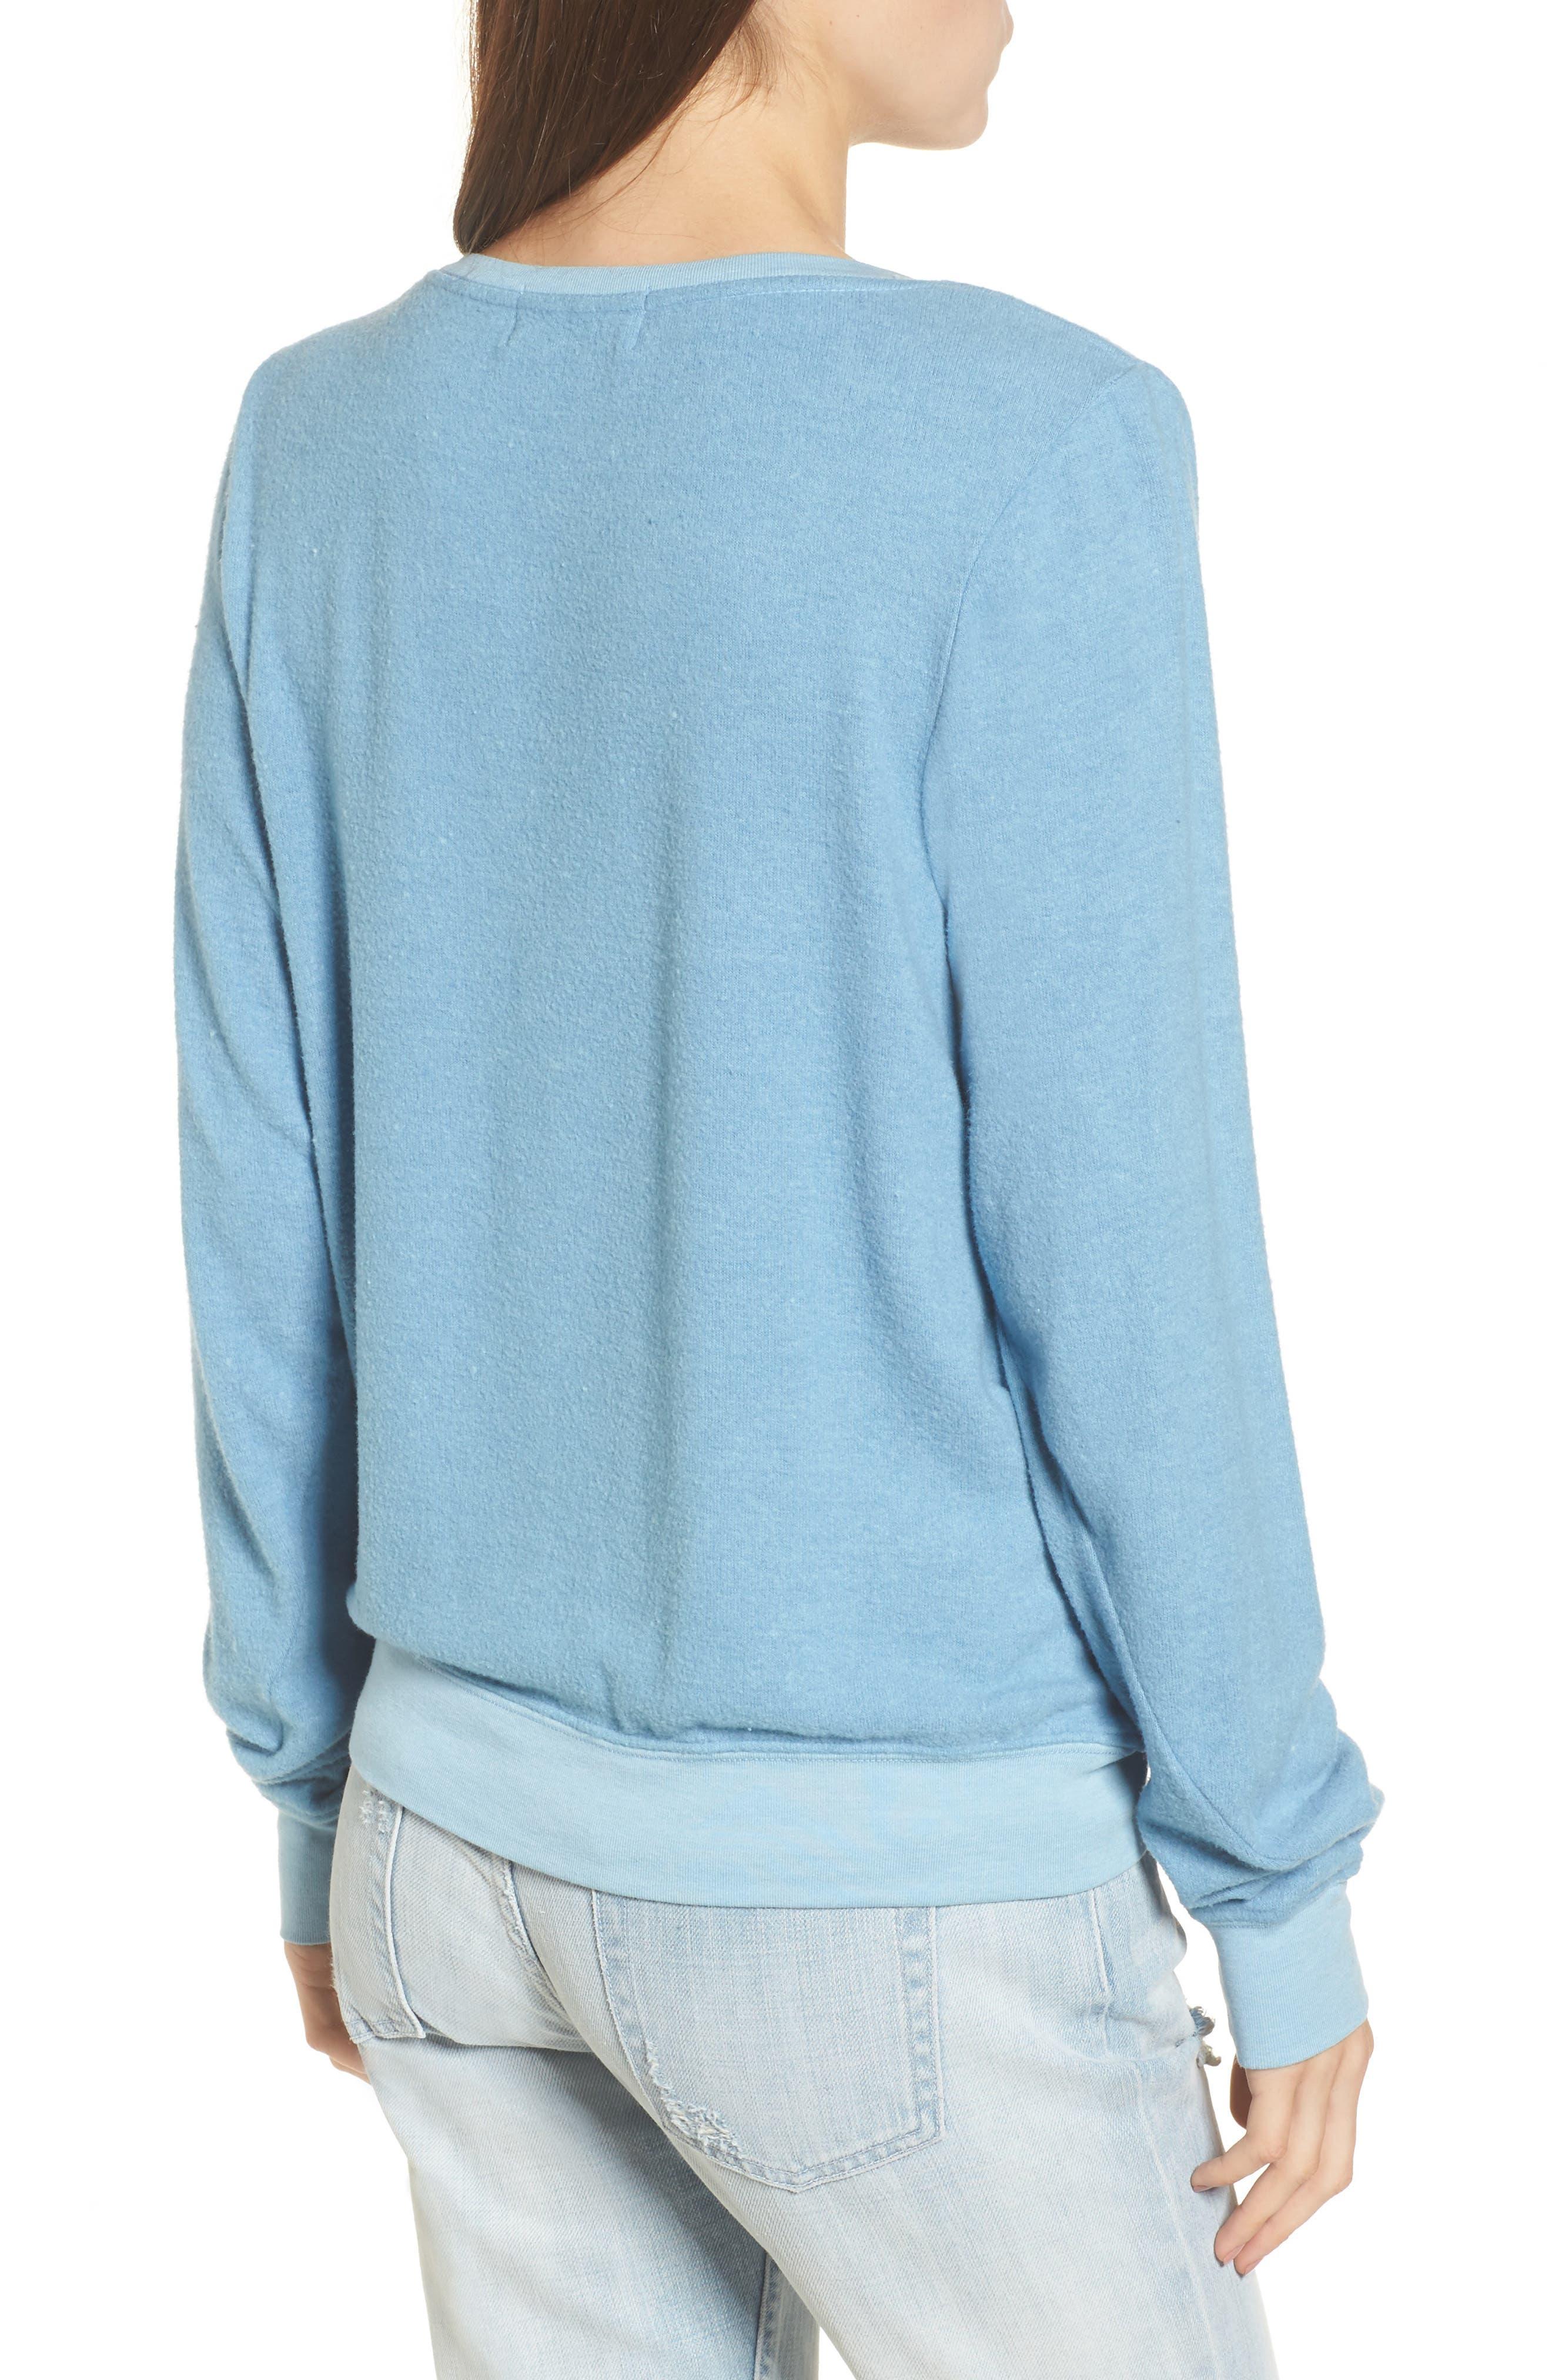 I Love You A Bunch Sweatshirt,                             Alternate thumbnail 2, color,                             420